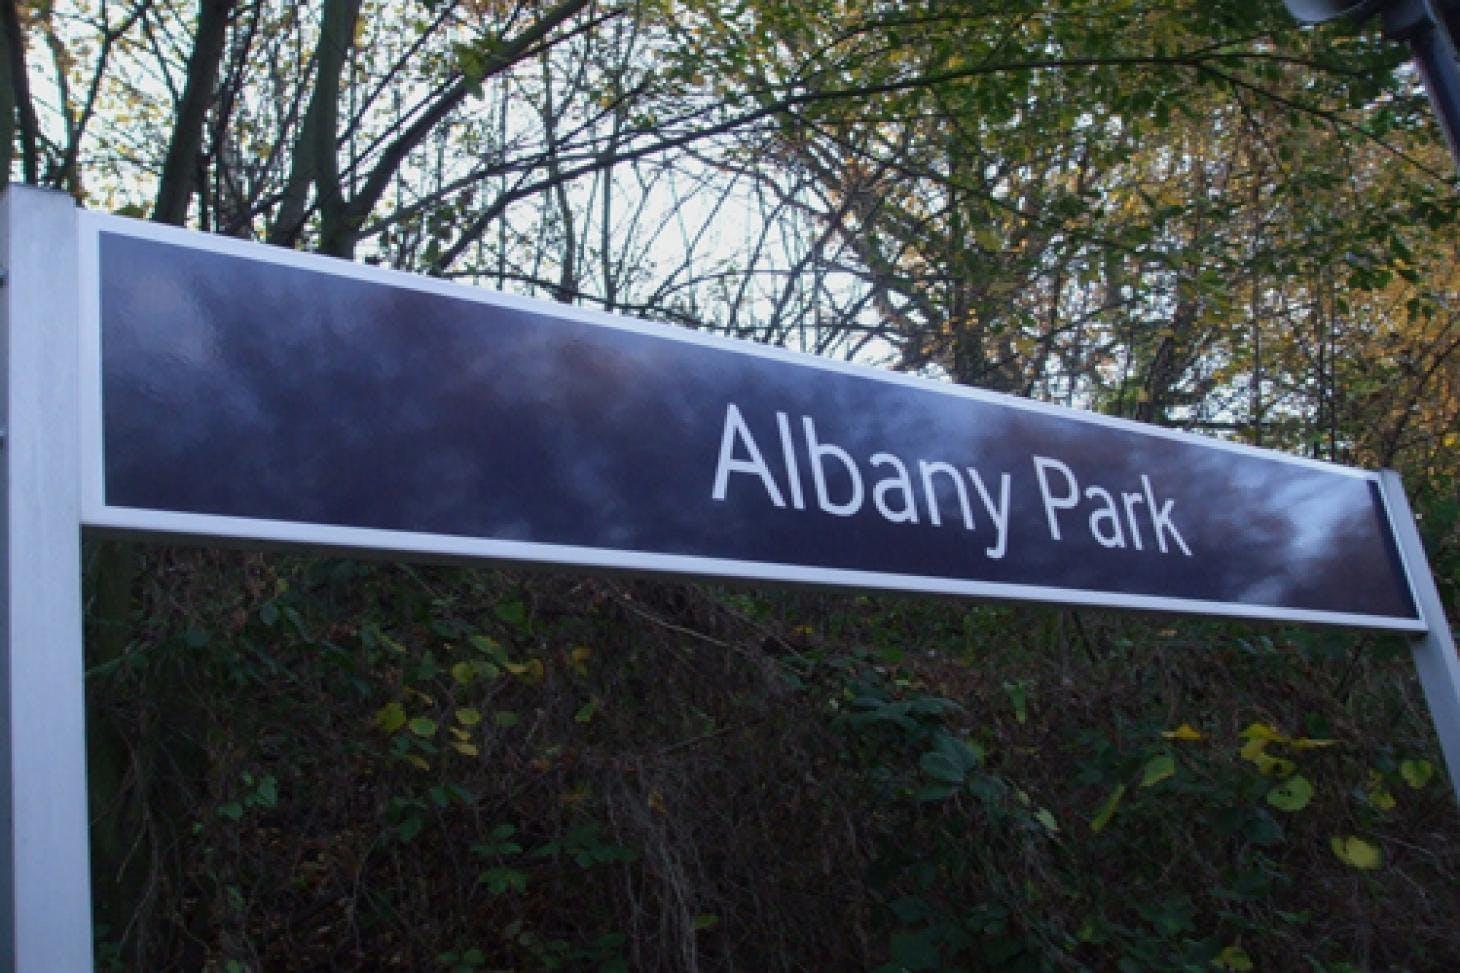 Albany Park Outdoor | Hard (macadam) tennis court